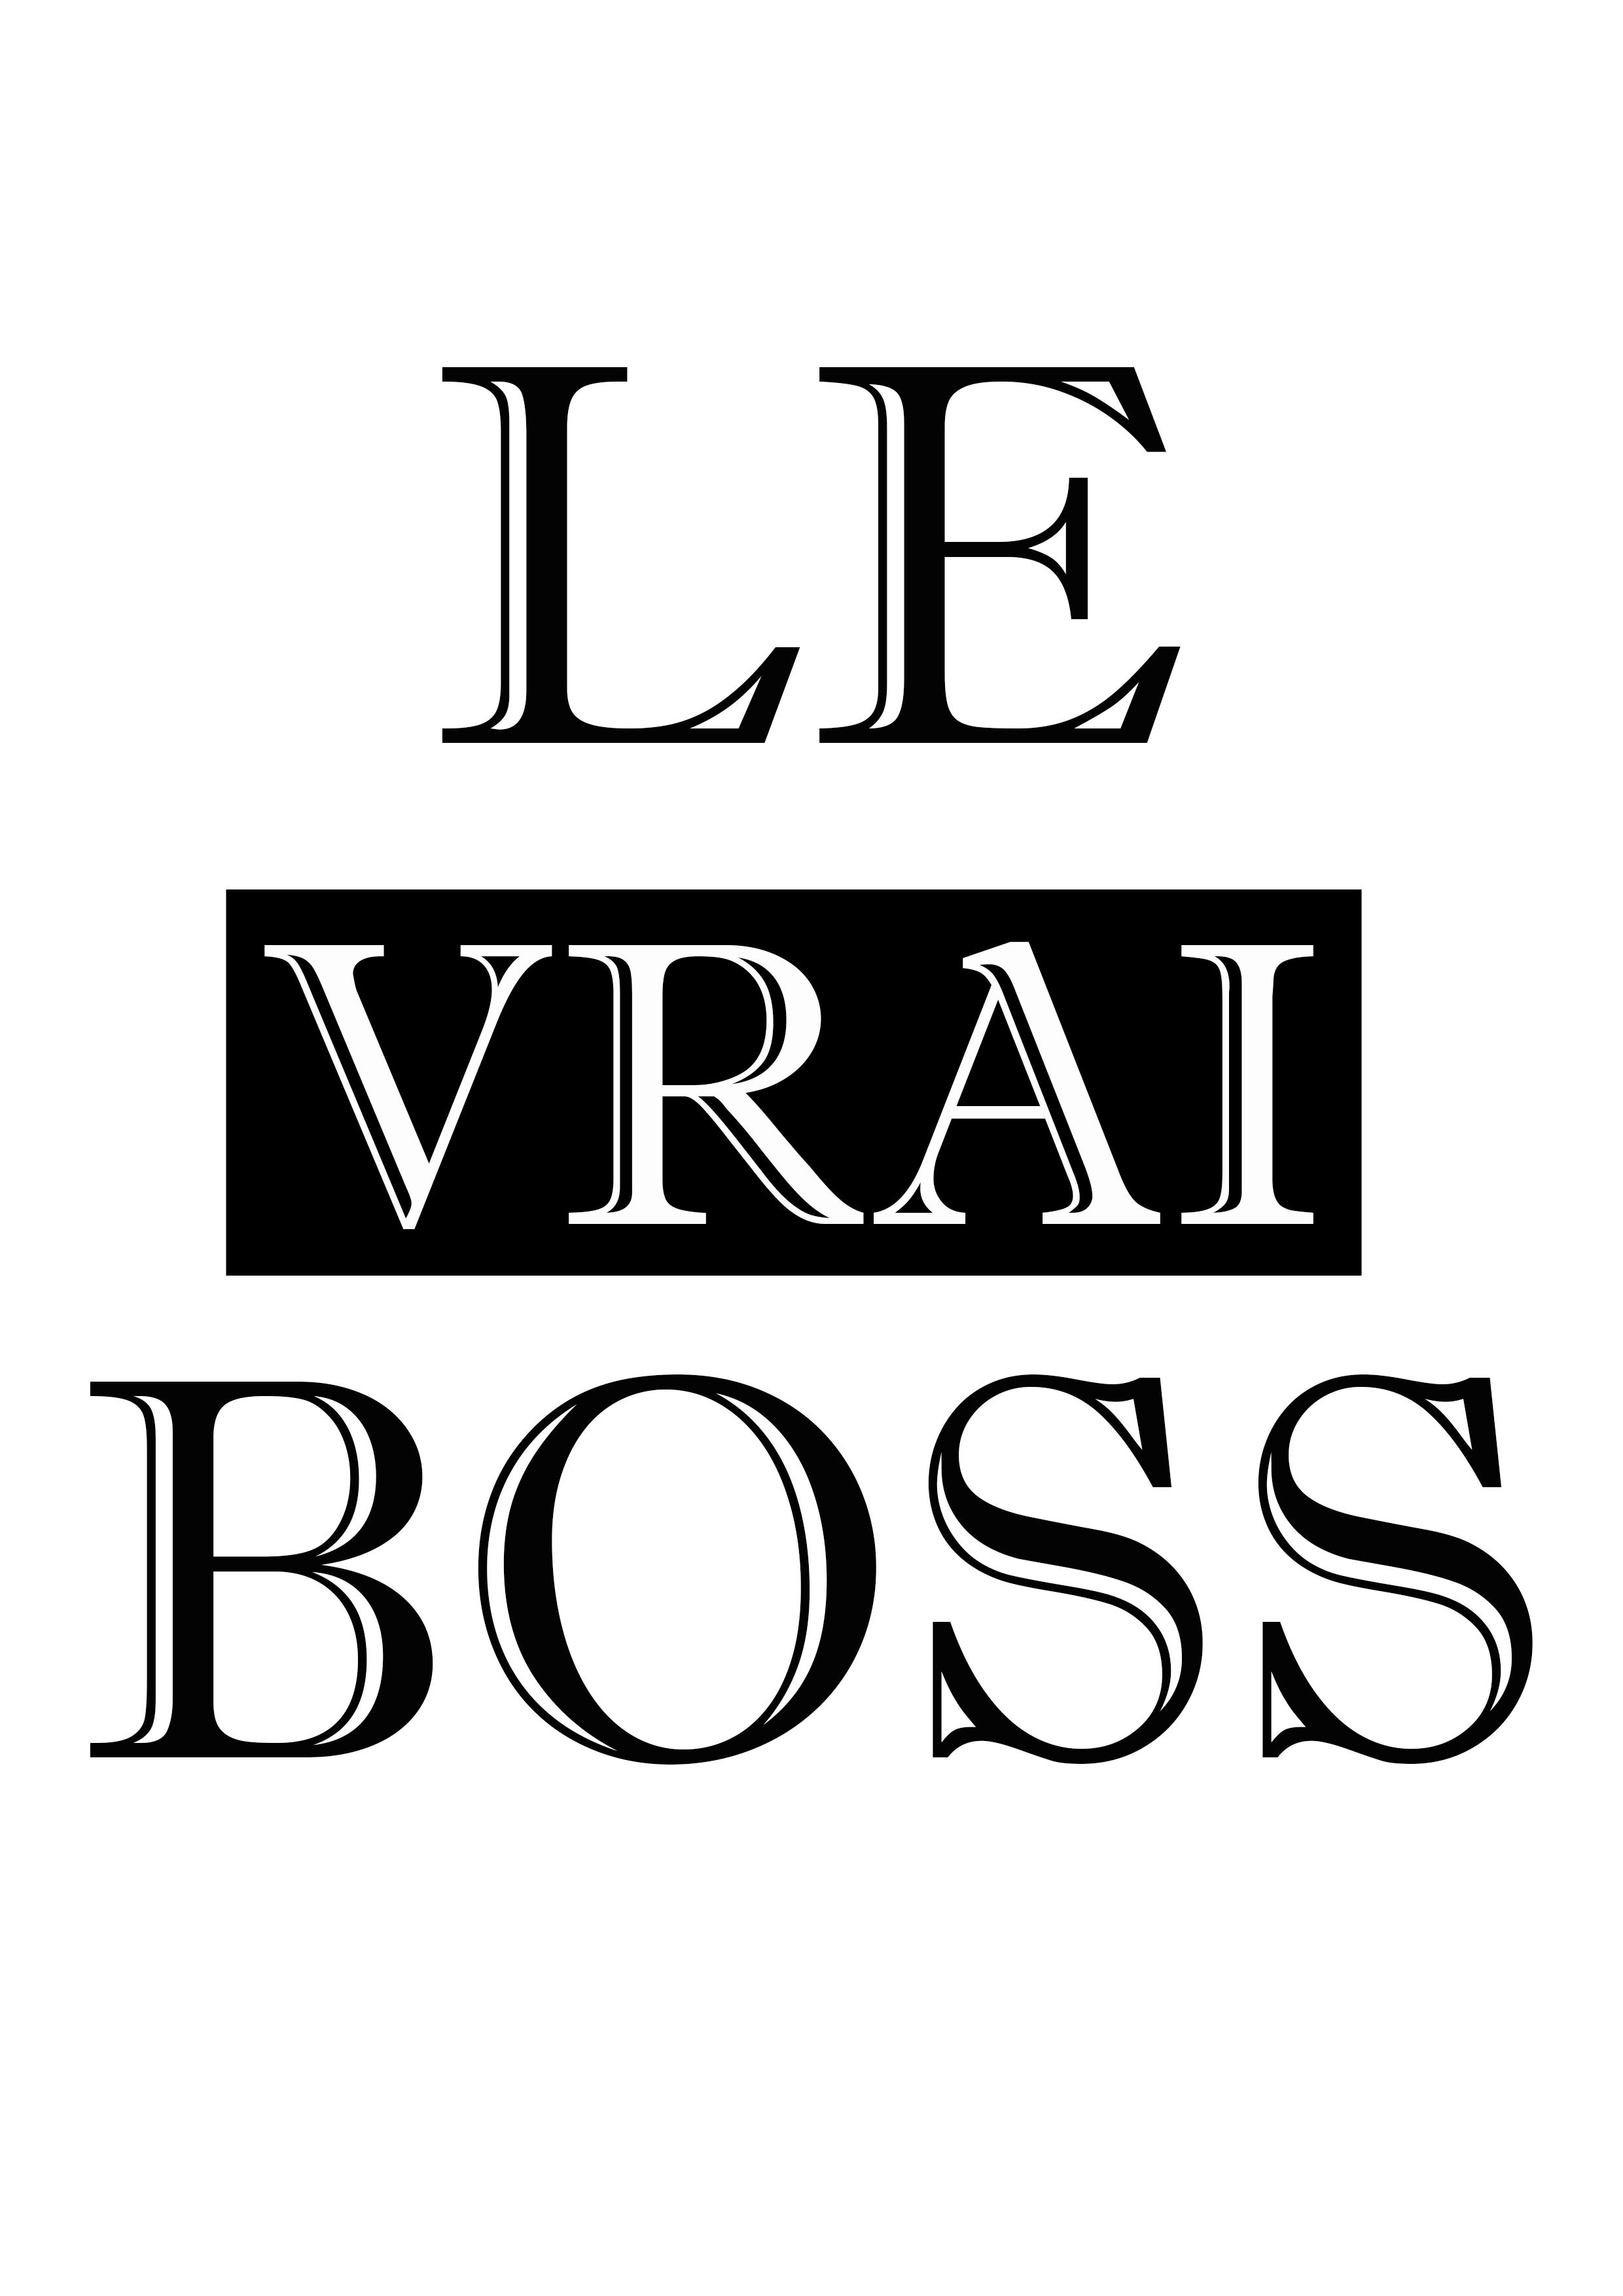 Le vrai boss